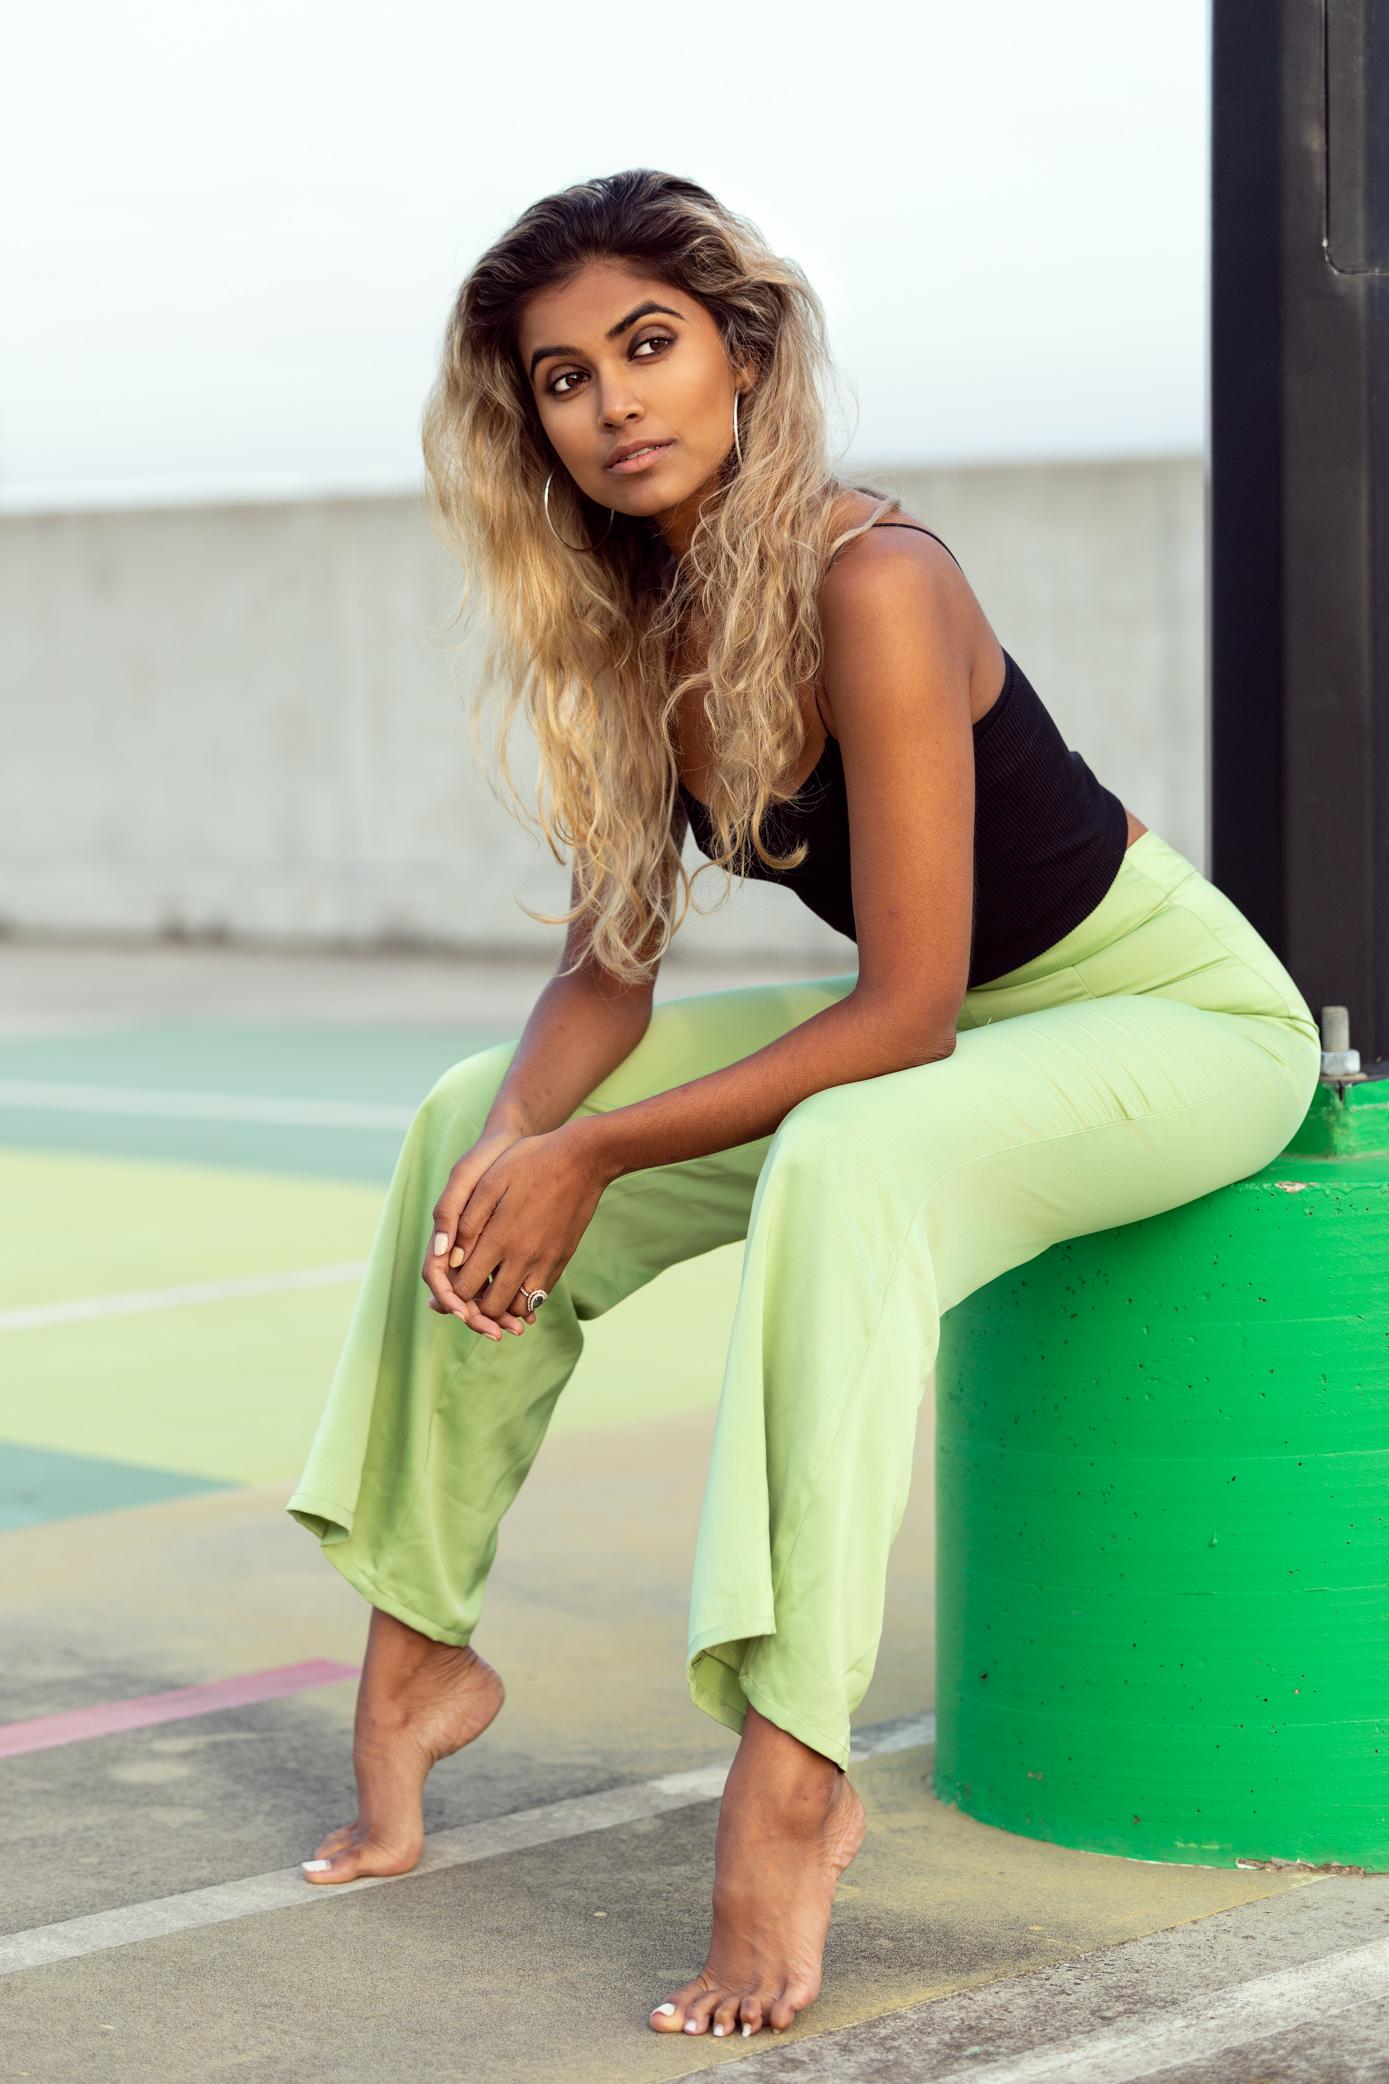 mandy kota - flourish girl